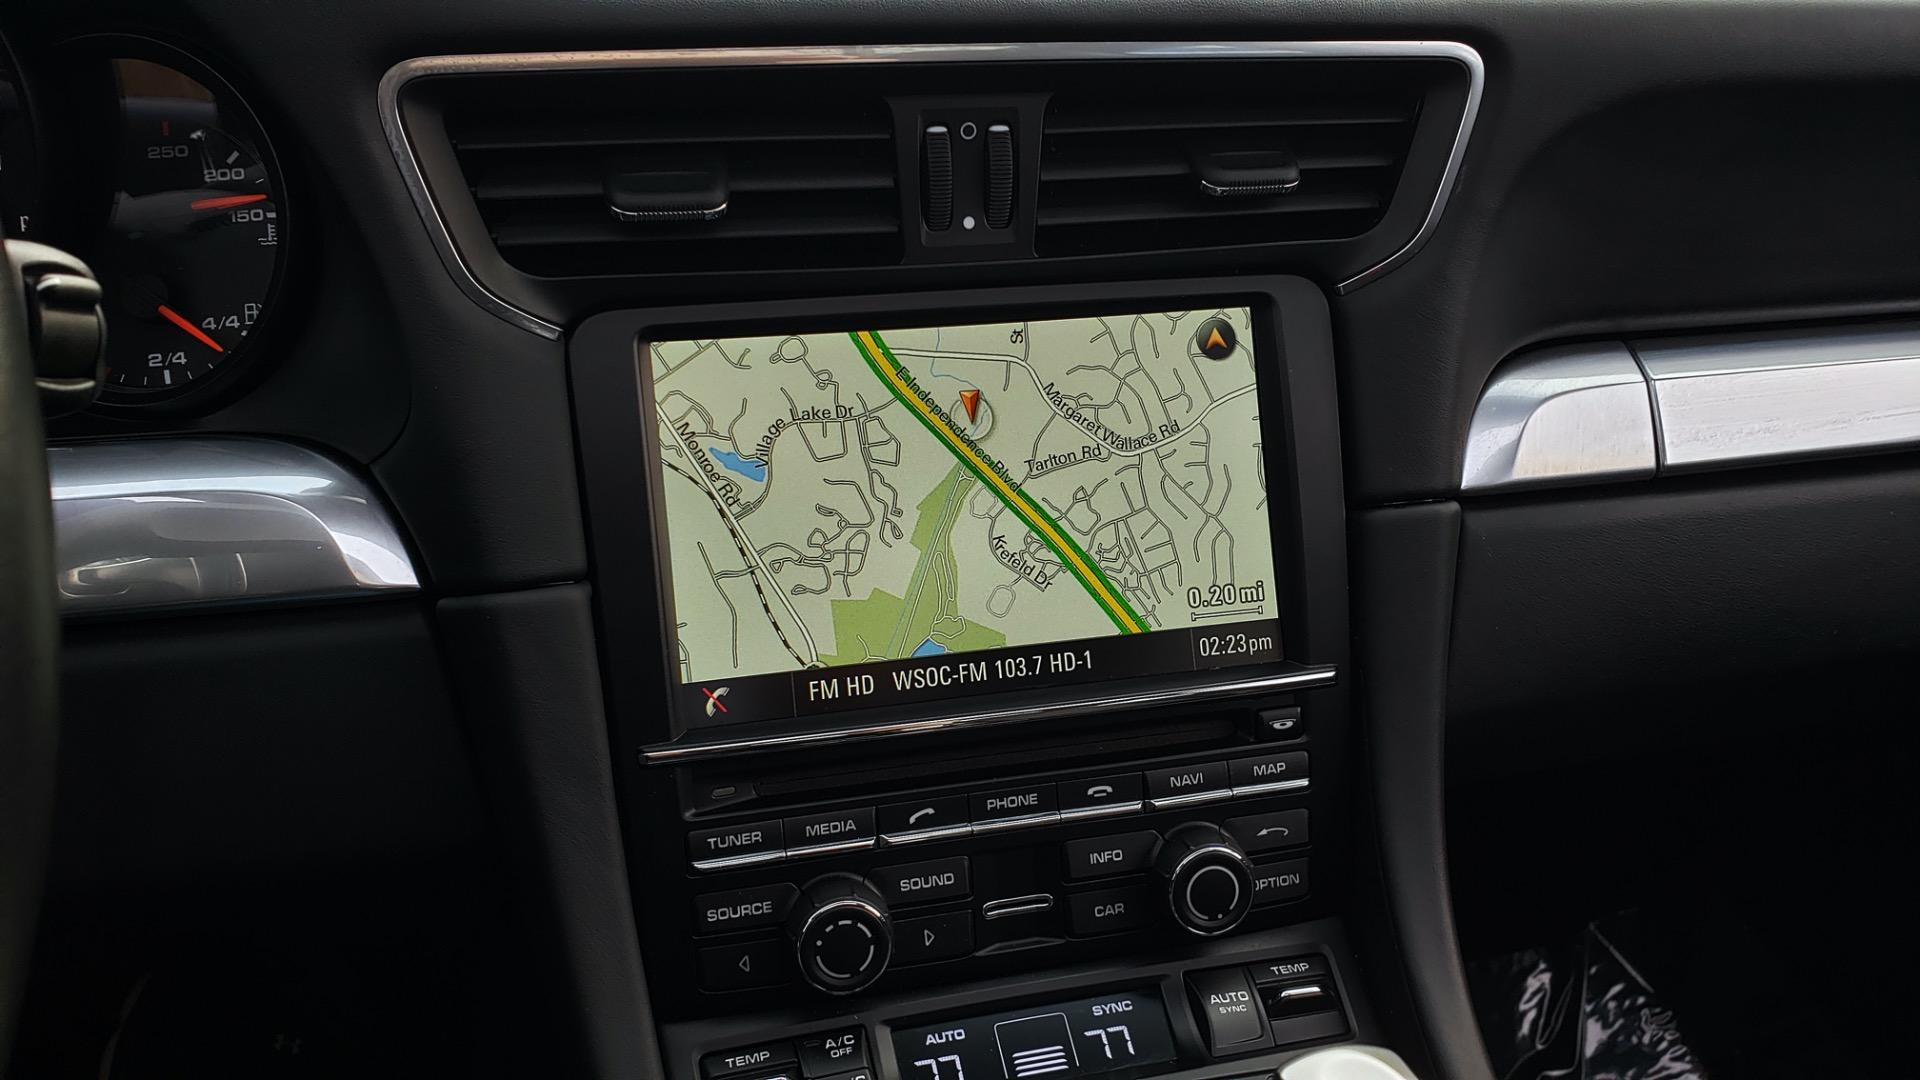 Used 2014 Porsche 911 CARRERA 4S / PREM PKG PLUS / NAV / SUNROO / BOSE / CHRONO for sale Sold at Formula Imports in Charlotte NC 28227 46